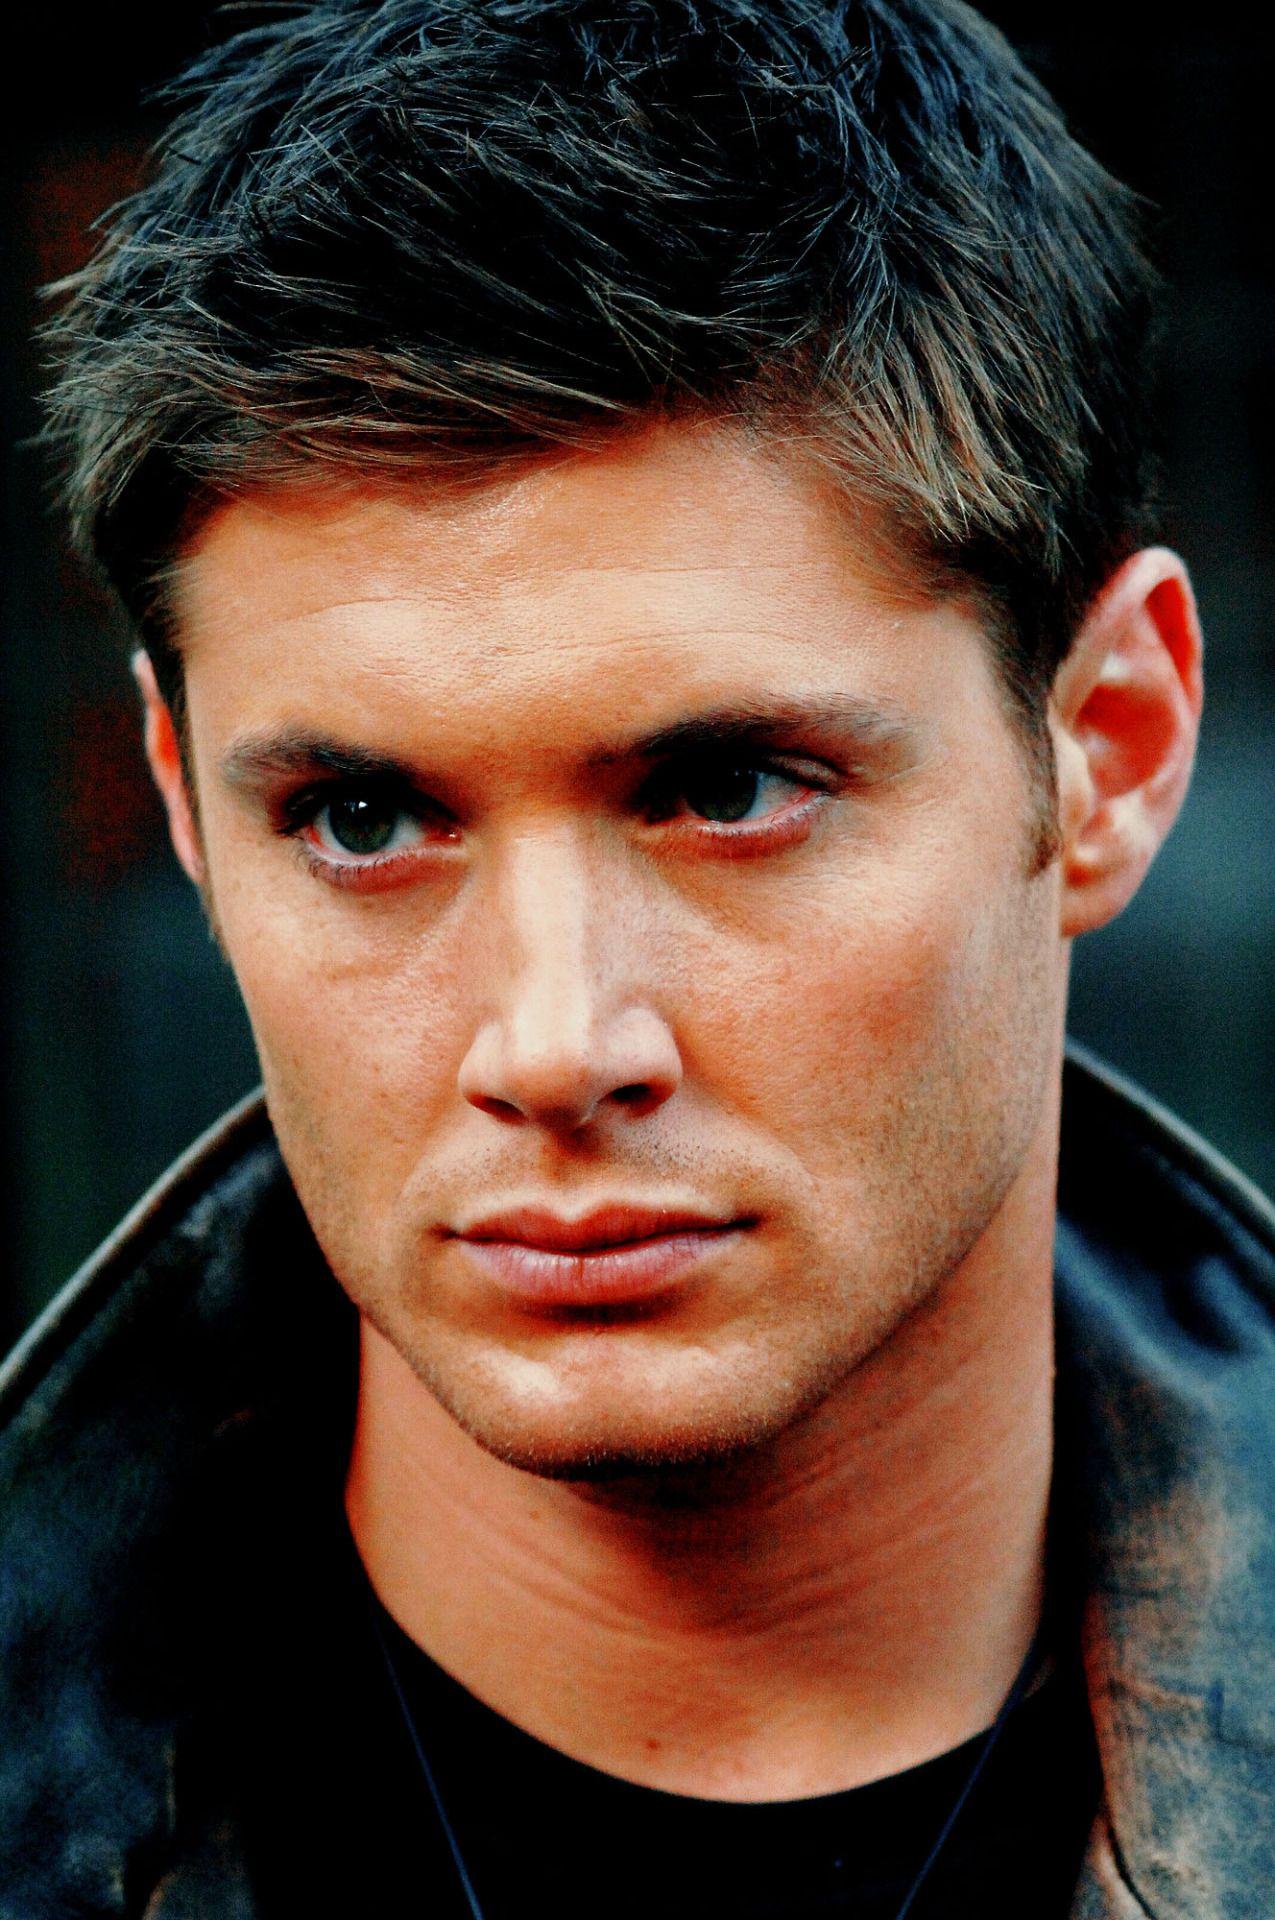 Supernatural 1x07 Hookman Dean Winchester Hair Jensen Ackles Haircut Jensen Ackles